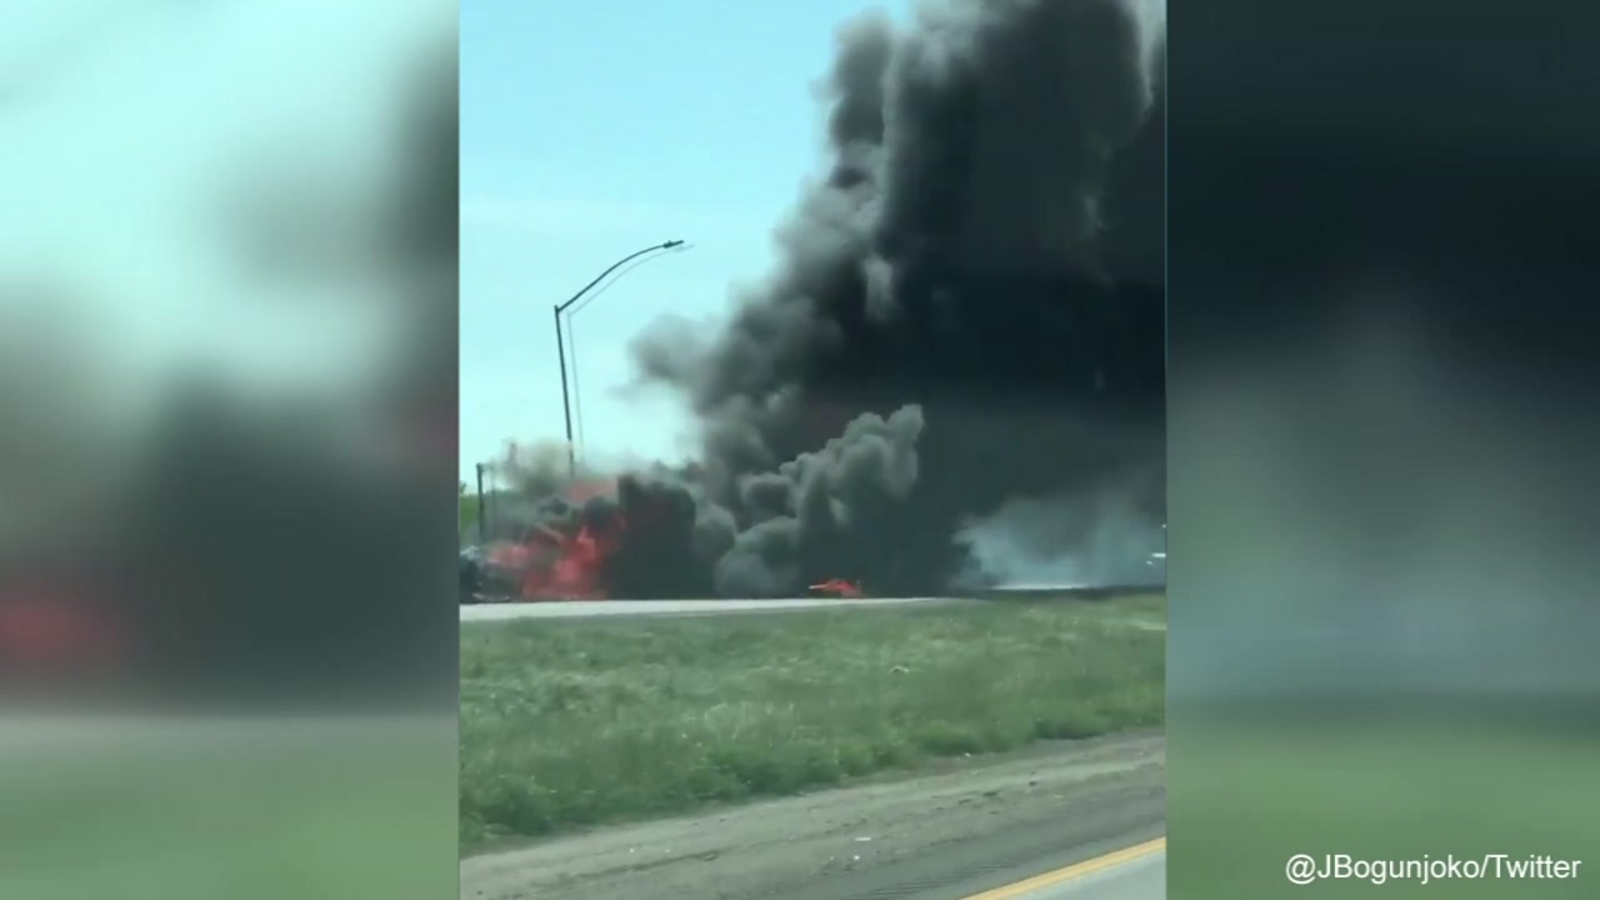 Fiery big rig crash shuts down I-5 near Modesto